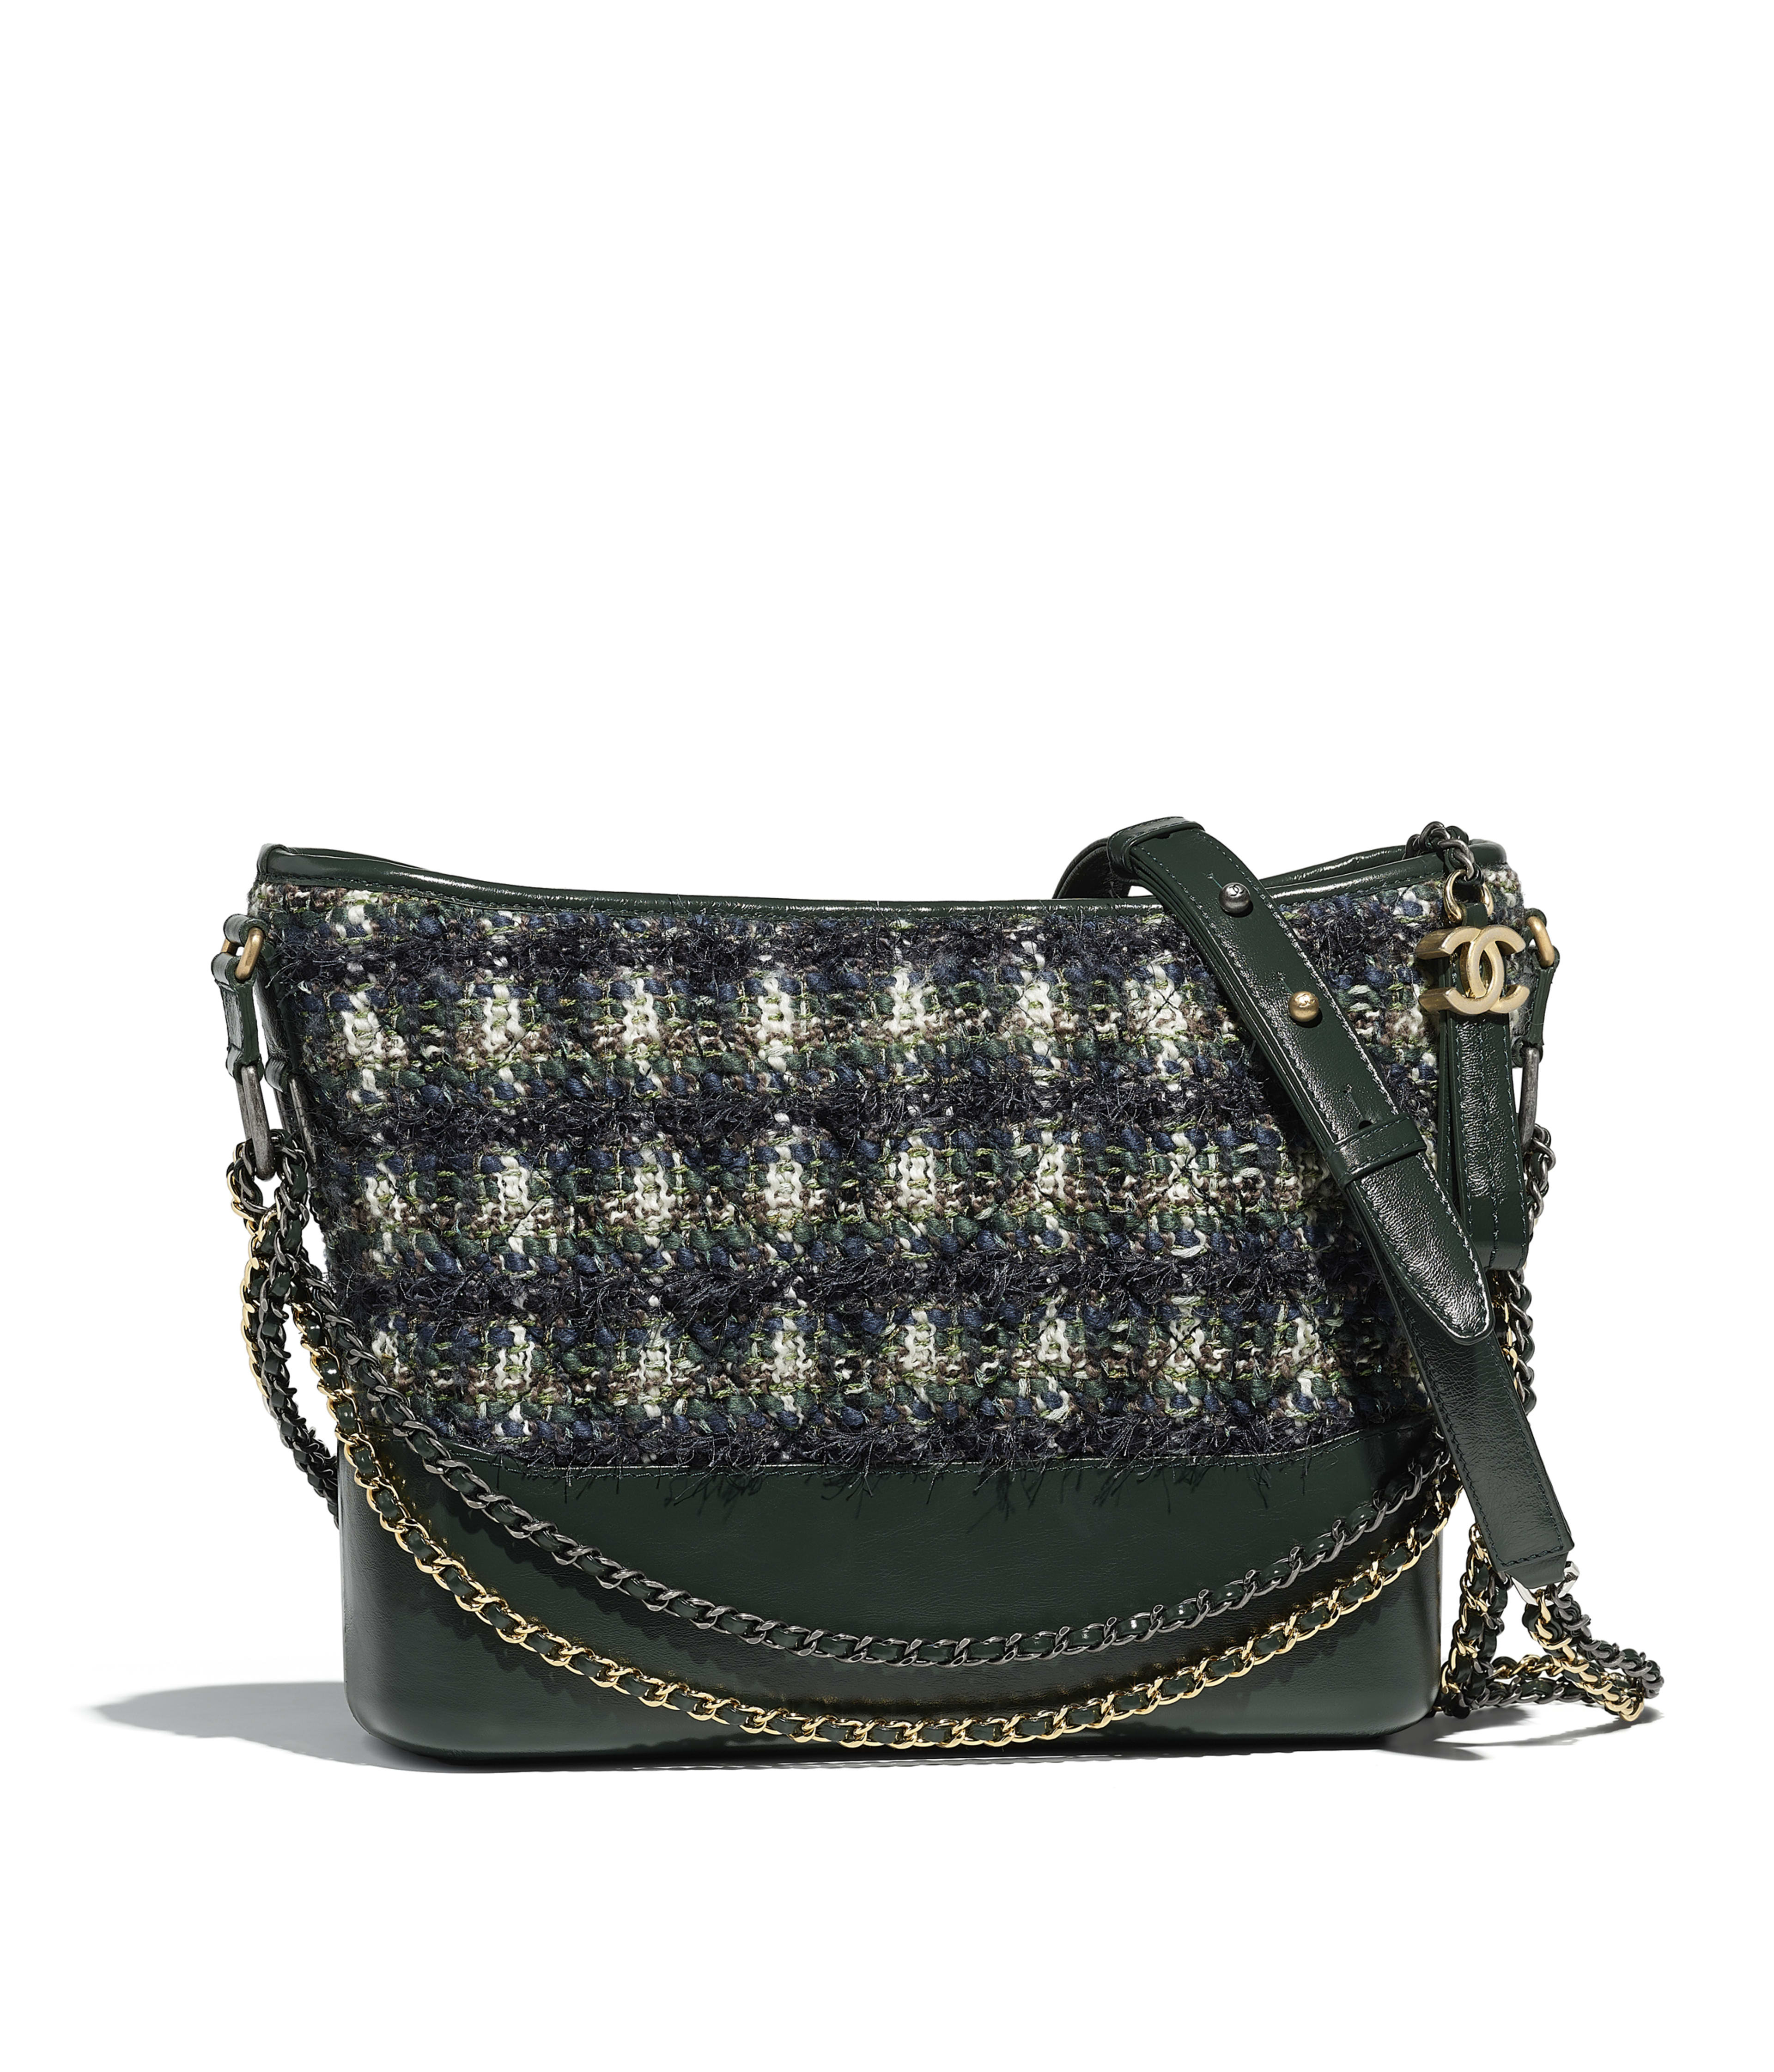 Chanel S Gabrielle Hobo Bag Tweed Calfskin Silver Tone Gold Metal Green Blue White Ref A93824y83989k1124